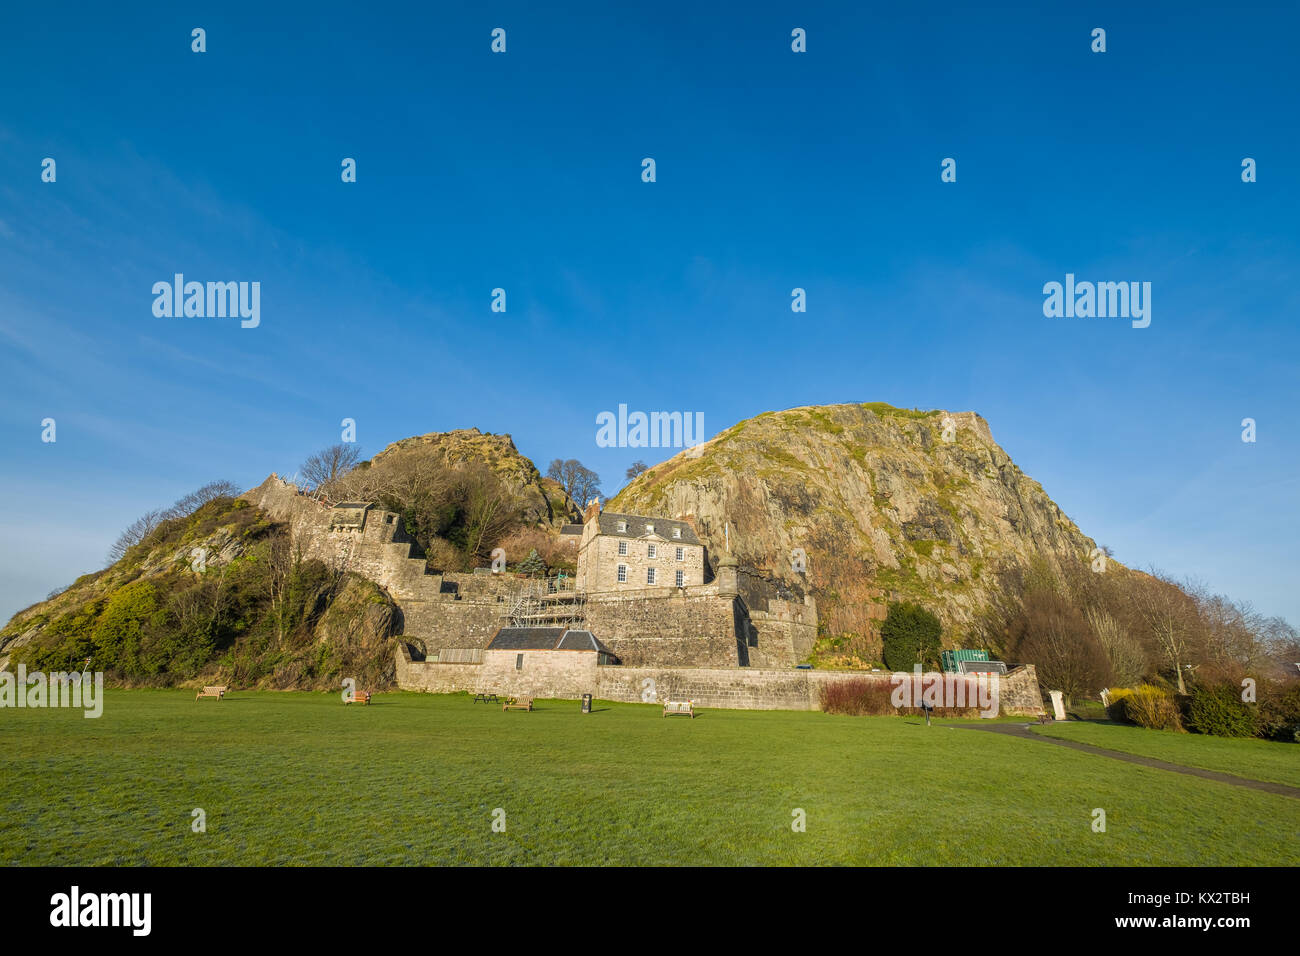 Dumbarton Castle and Dumbarton rock, West Dumbartonshire, Scotland - Stock Image